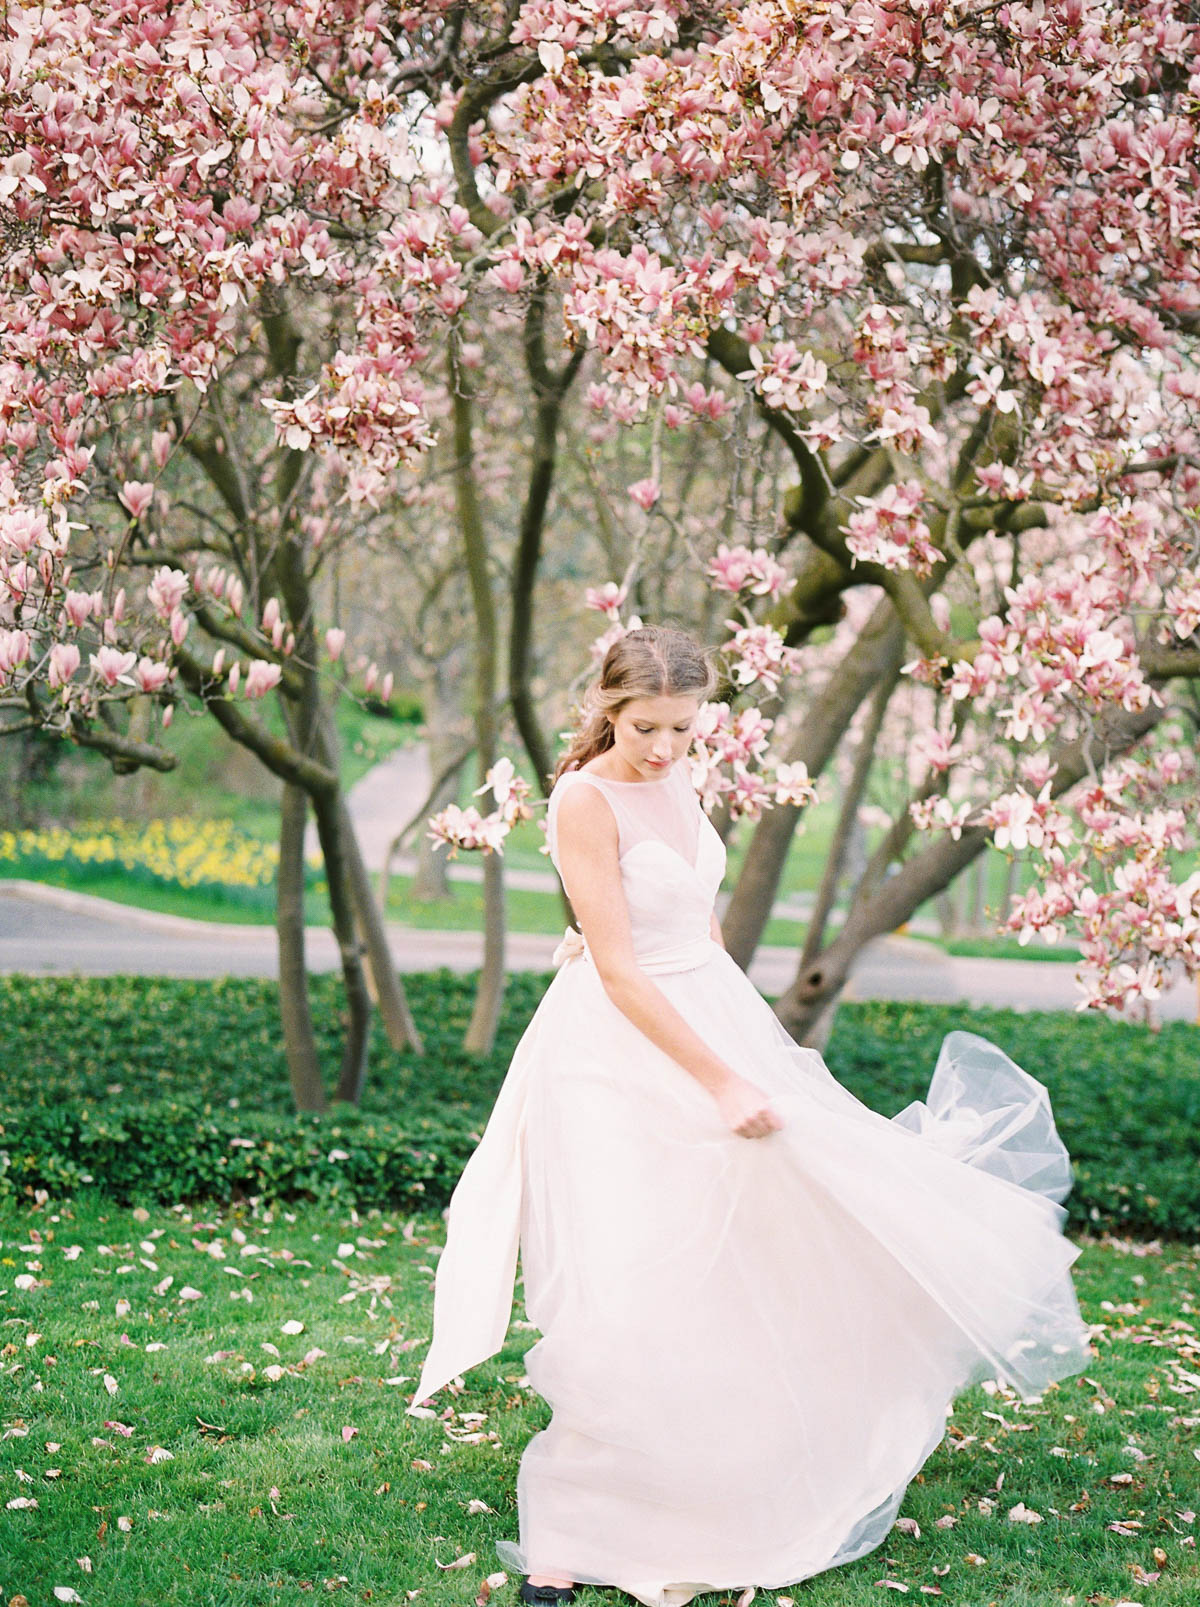 julia-park-photography-vineyard-bride-swish-list-niagara-on-the-lake-wedding-editorial-29.jpg